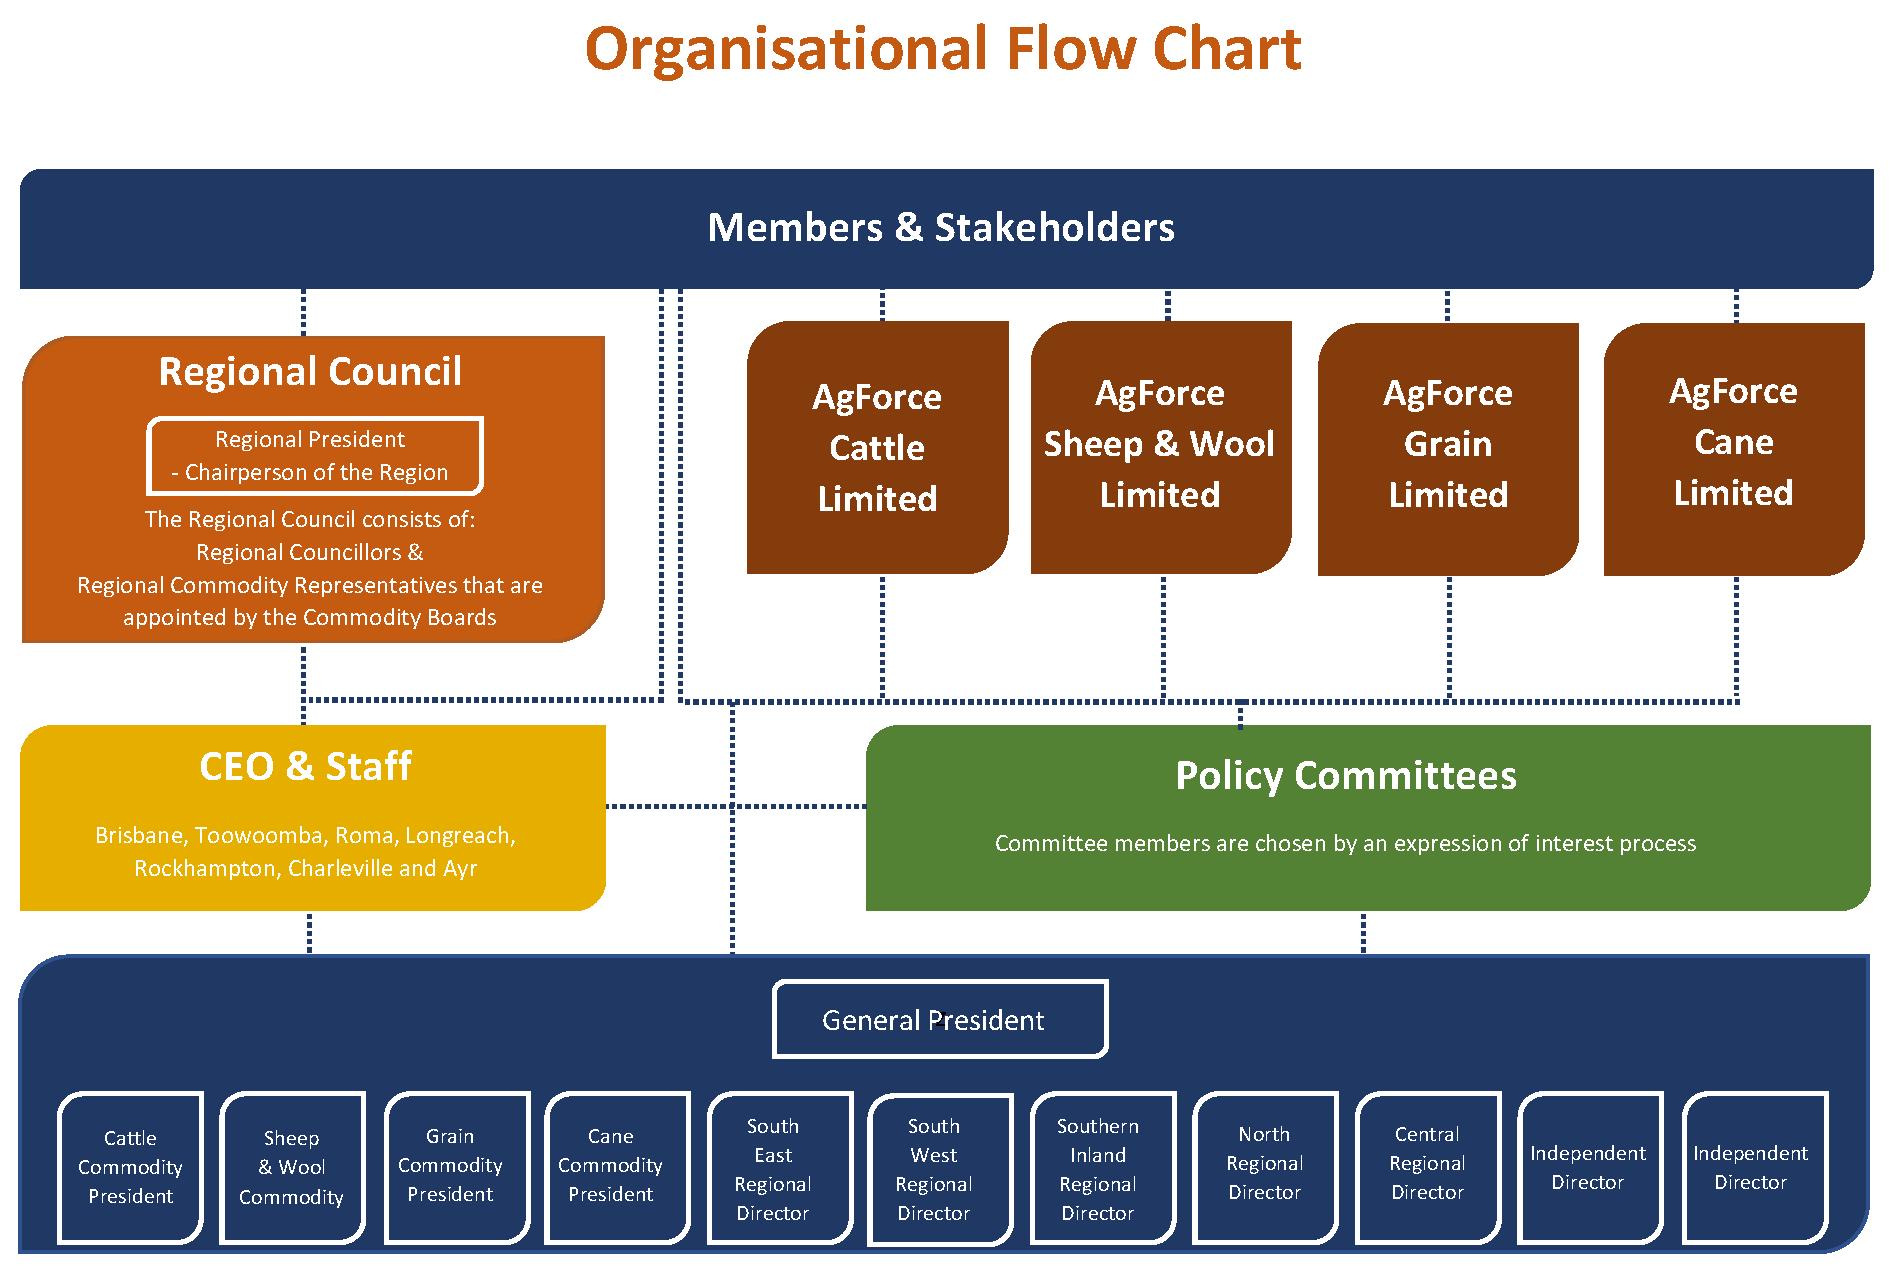 AgForce organisational chart